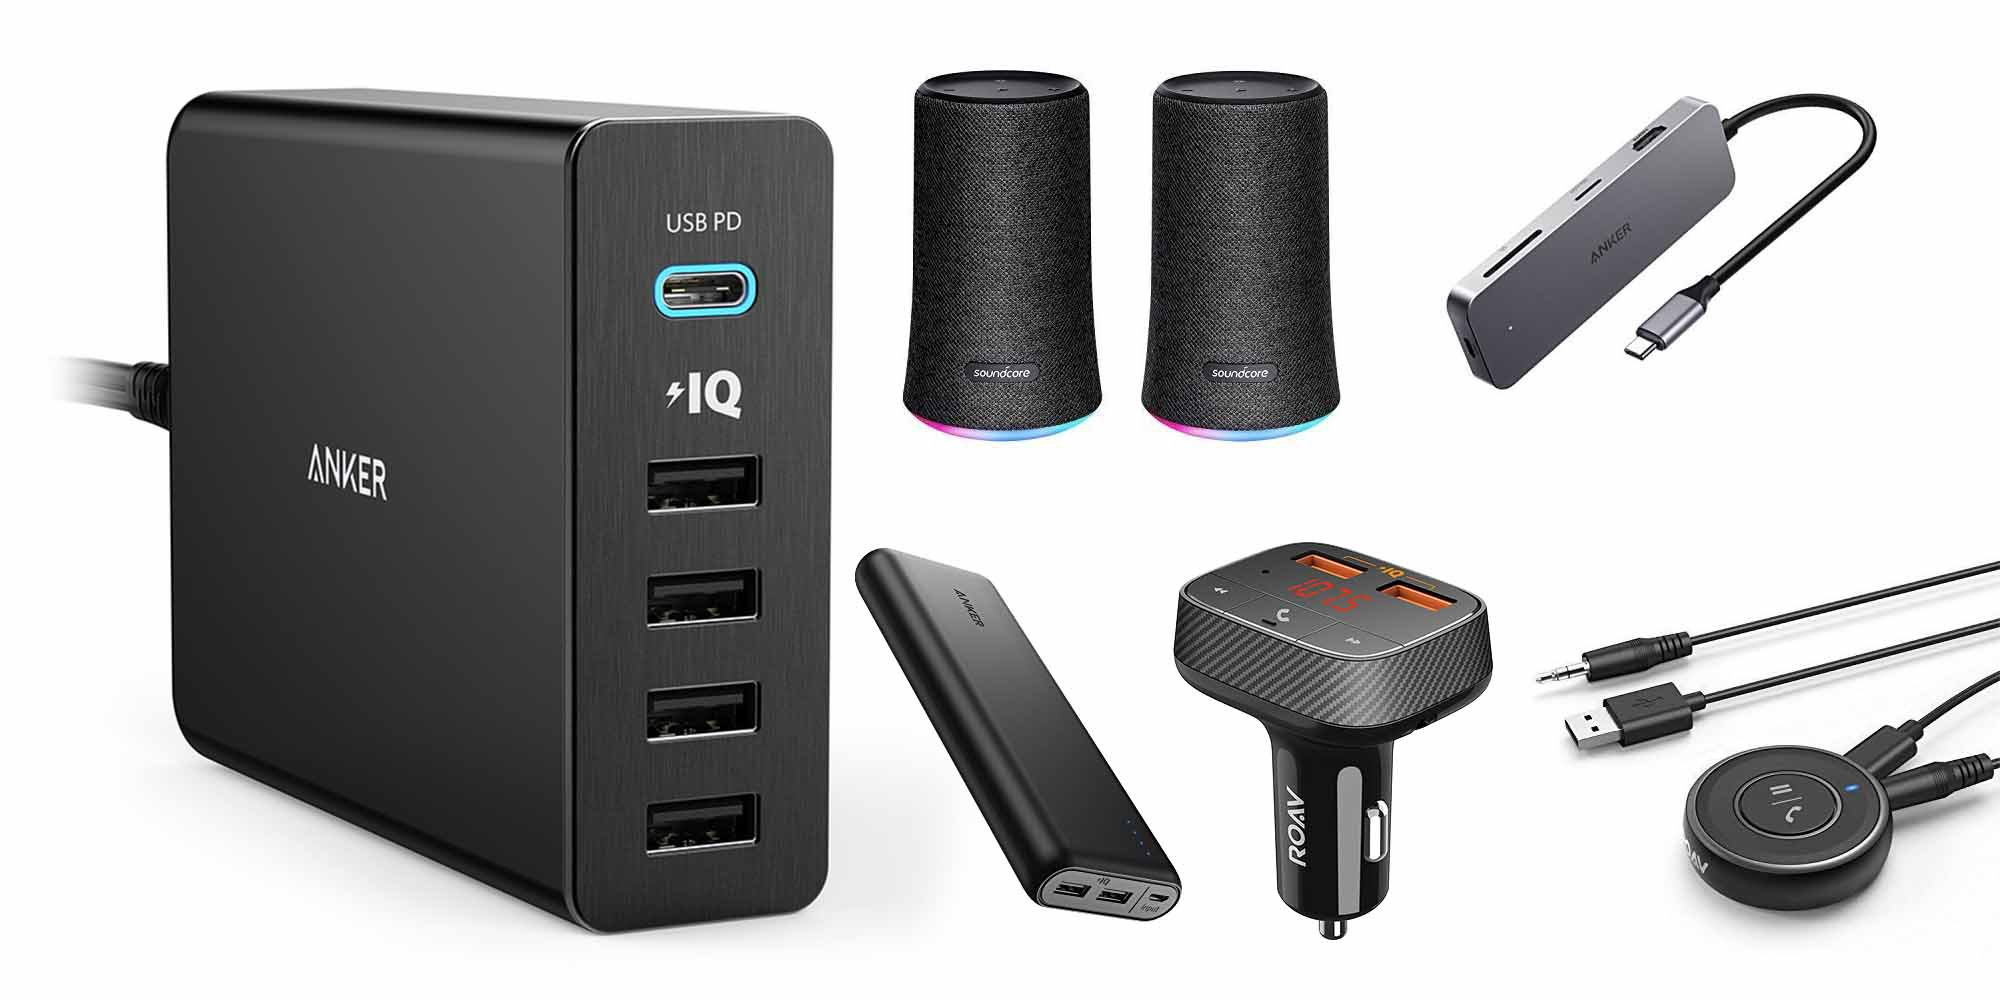 9to5Toys Letzter Anruf: LG G6 $ 333, Aukey 30000mAh USB-C Energien-Bank $ 42, Anker intelligenter Projektor $ 265, mehr